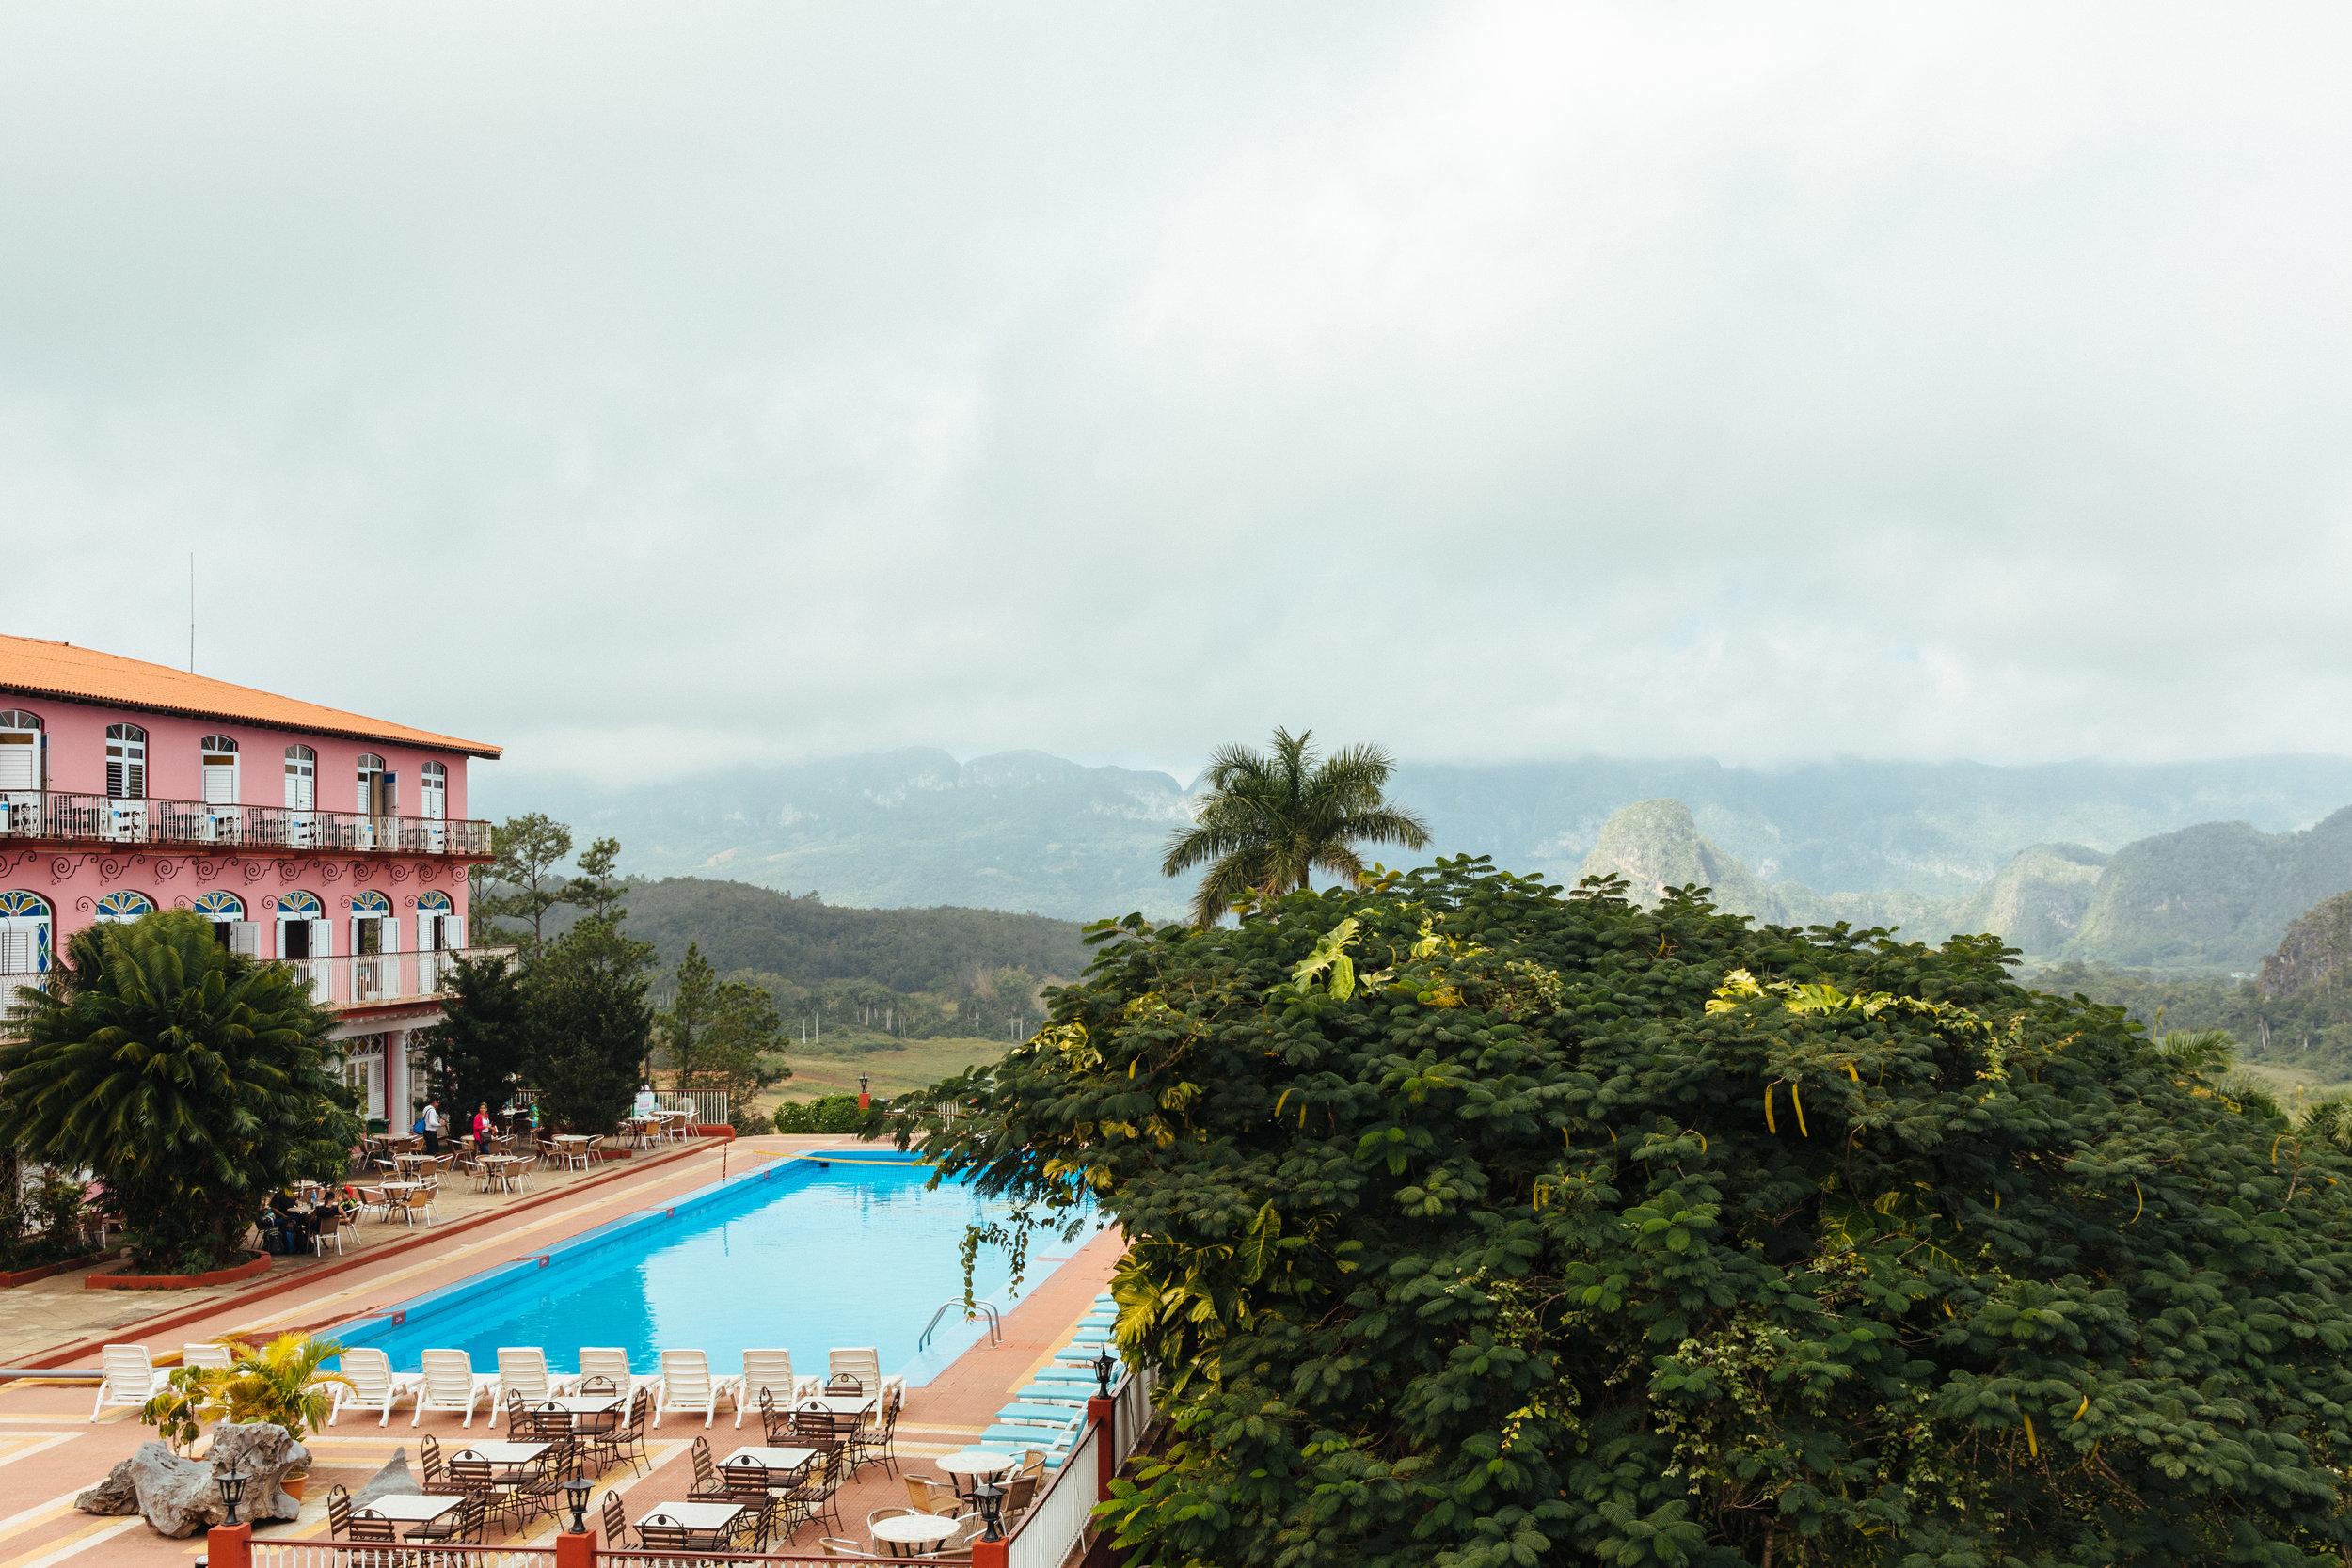 081217-Simone-Anne-Cuba-El-Camino-Travel-2.jpg